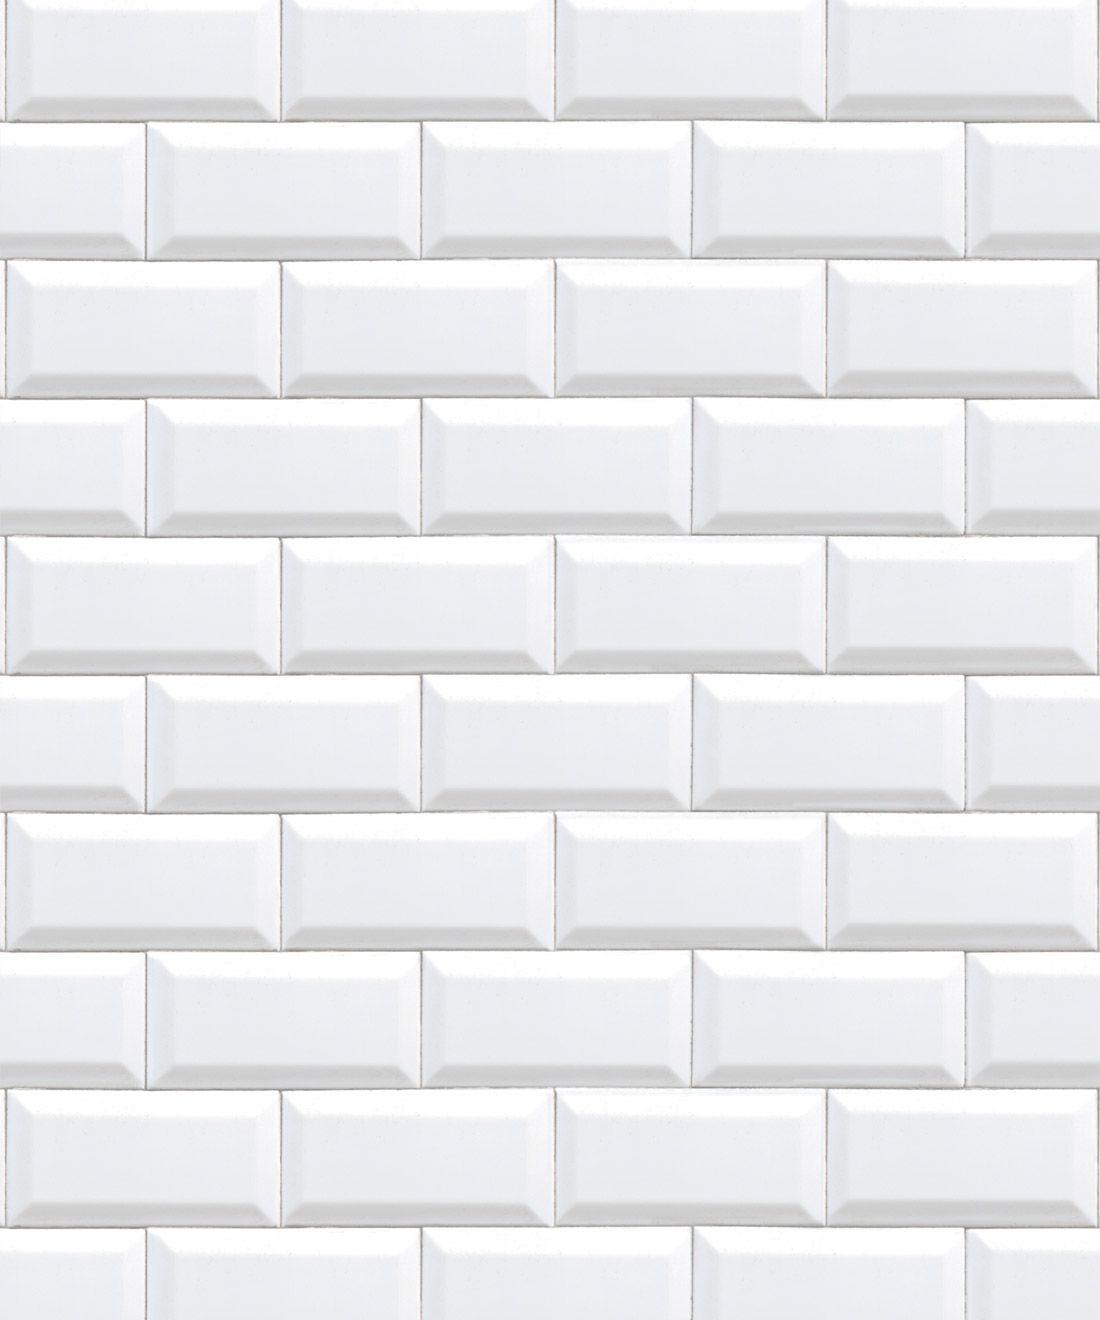 White Subway Tiles Wallpaper